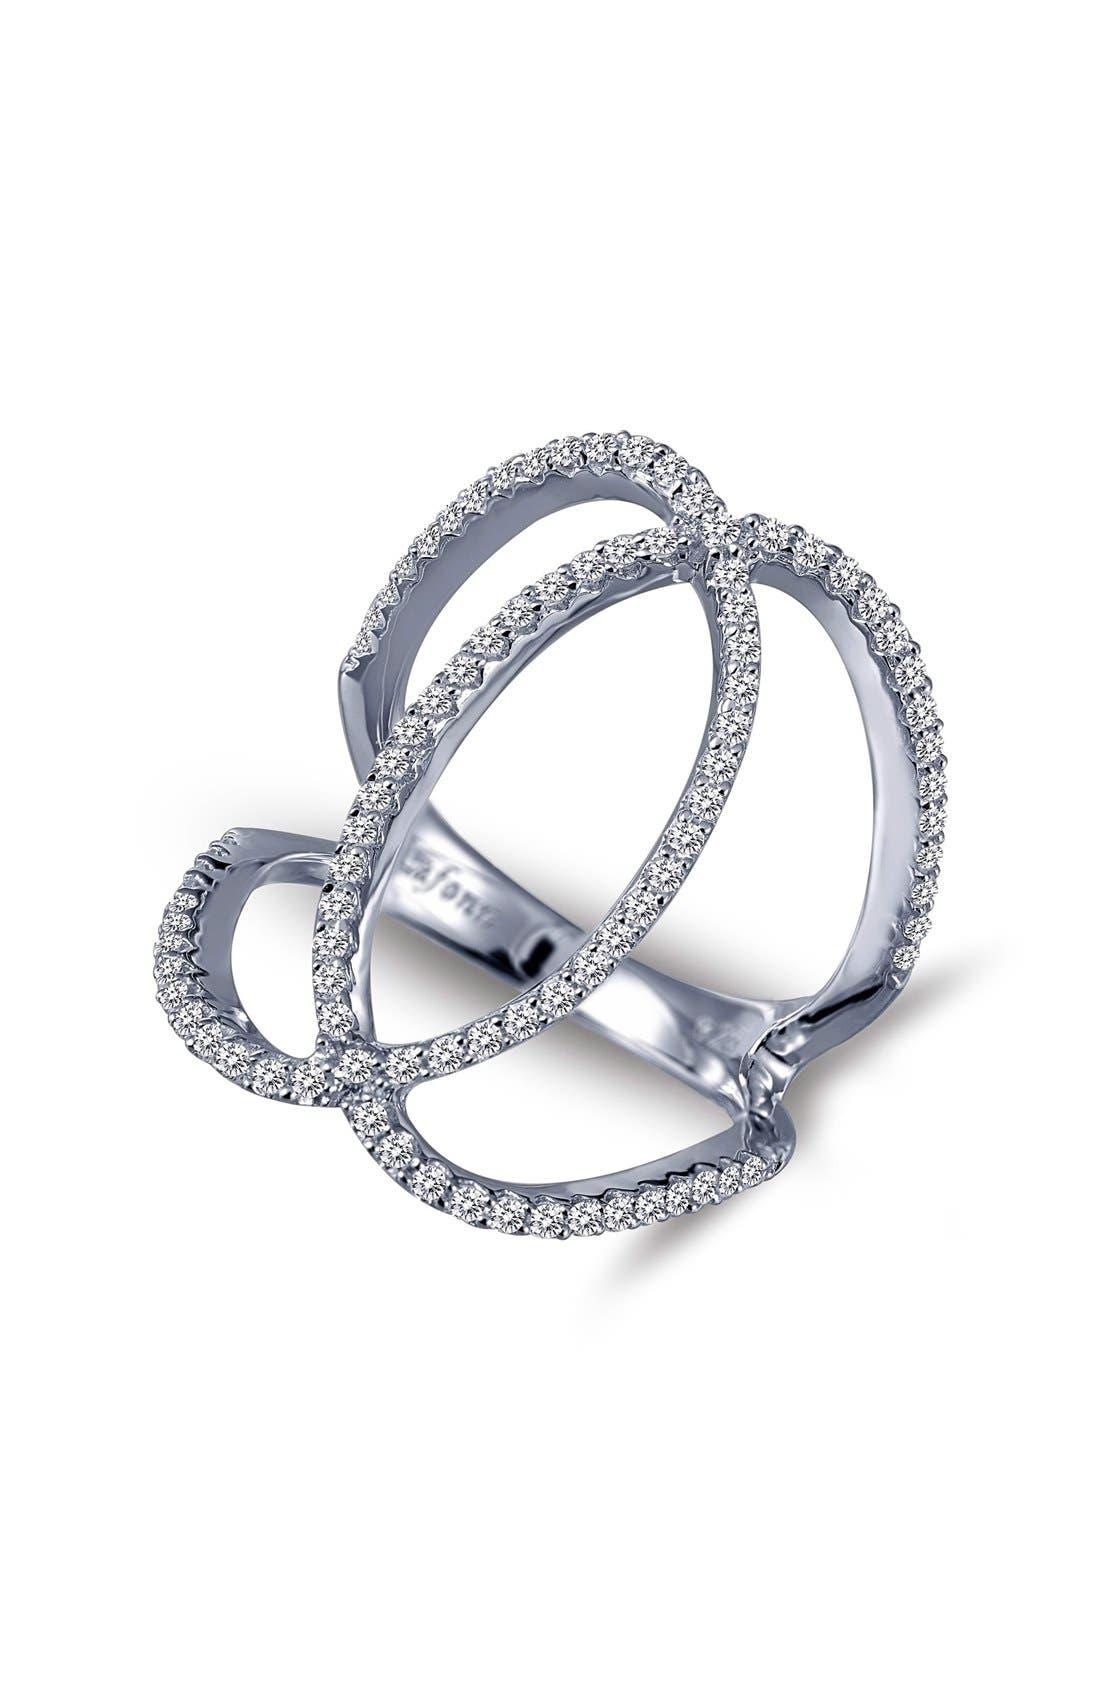 'Lassaire' Openwork Ring,                             Main thumbnail 1, color,                             040